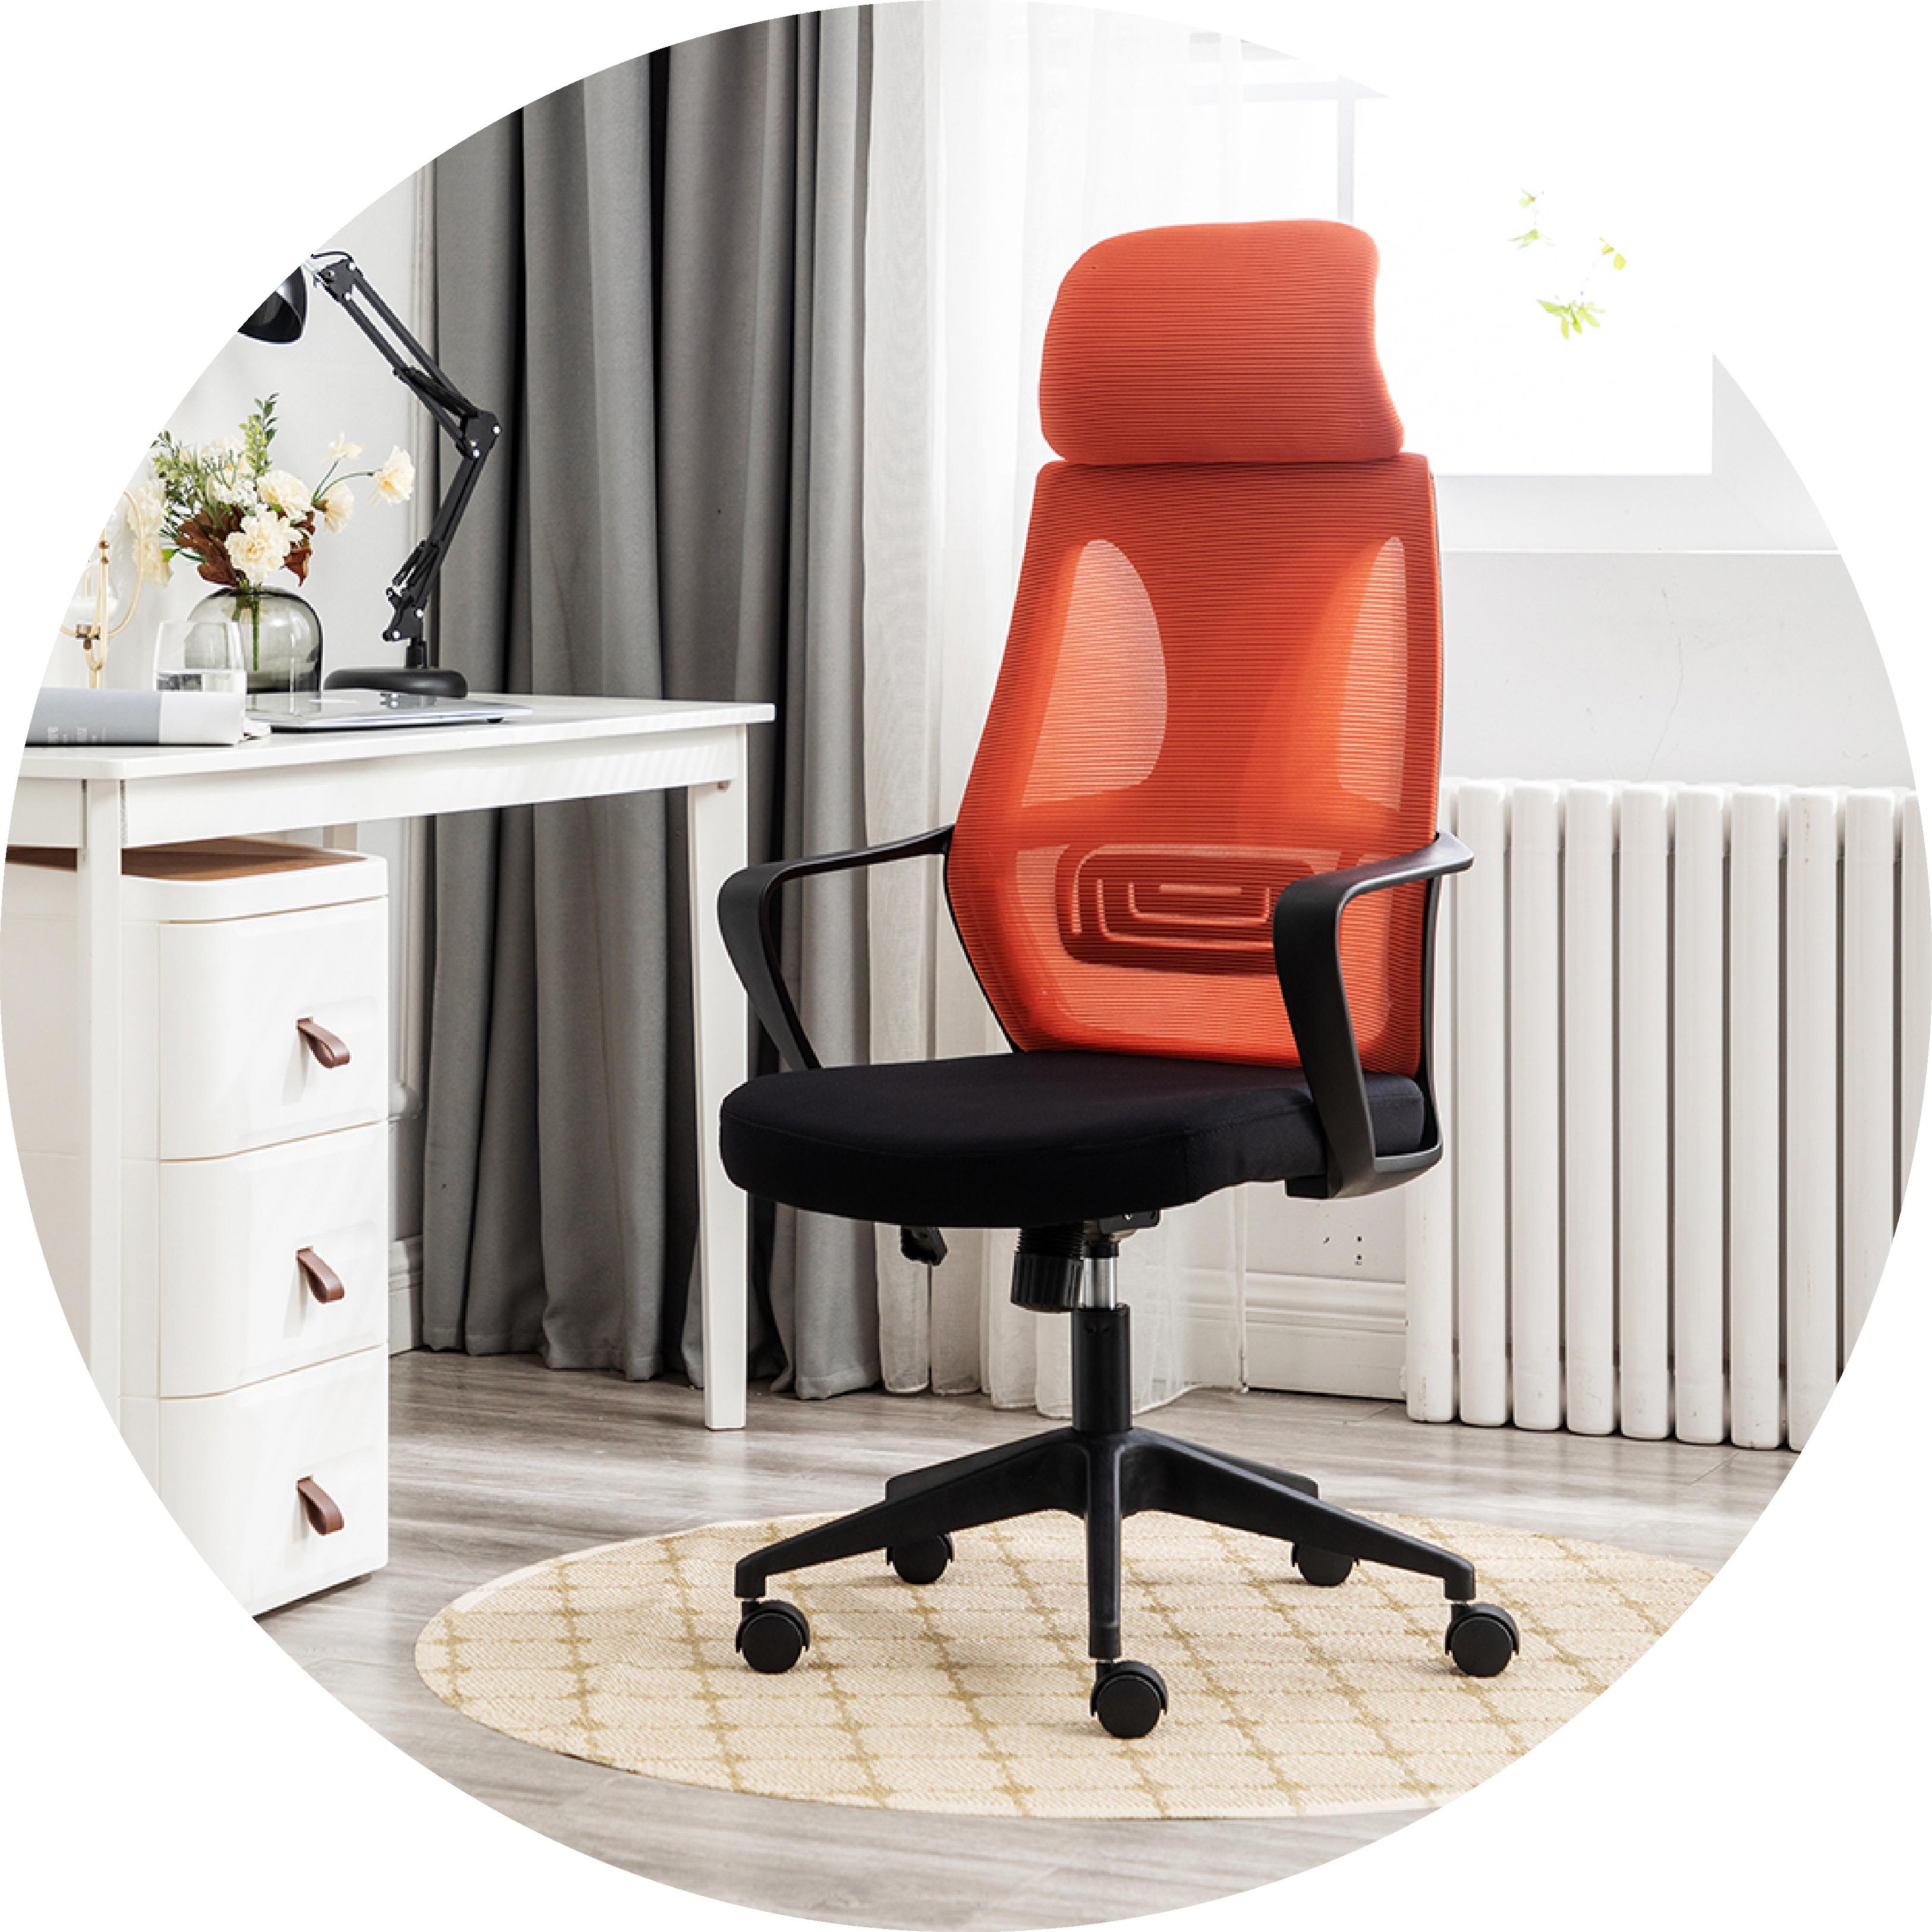 Office Chair Designer + Manufacturer